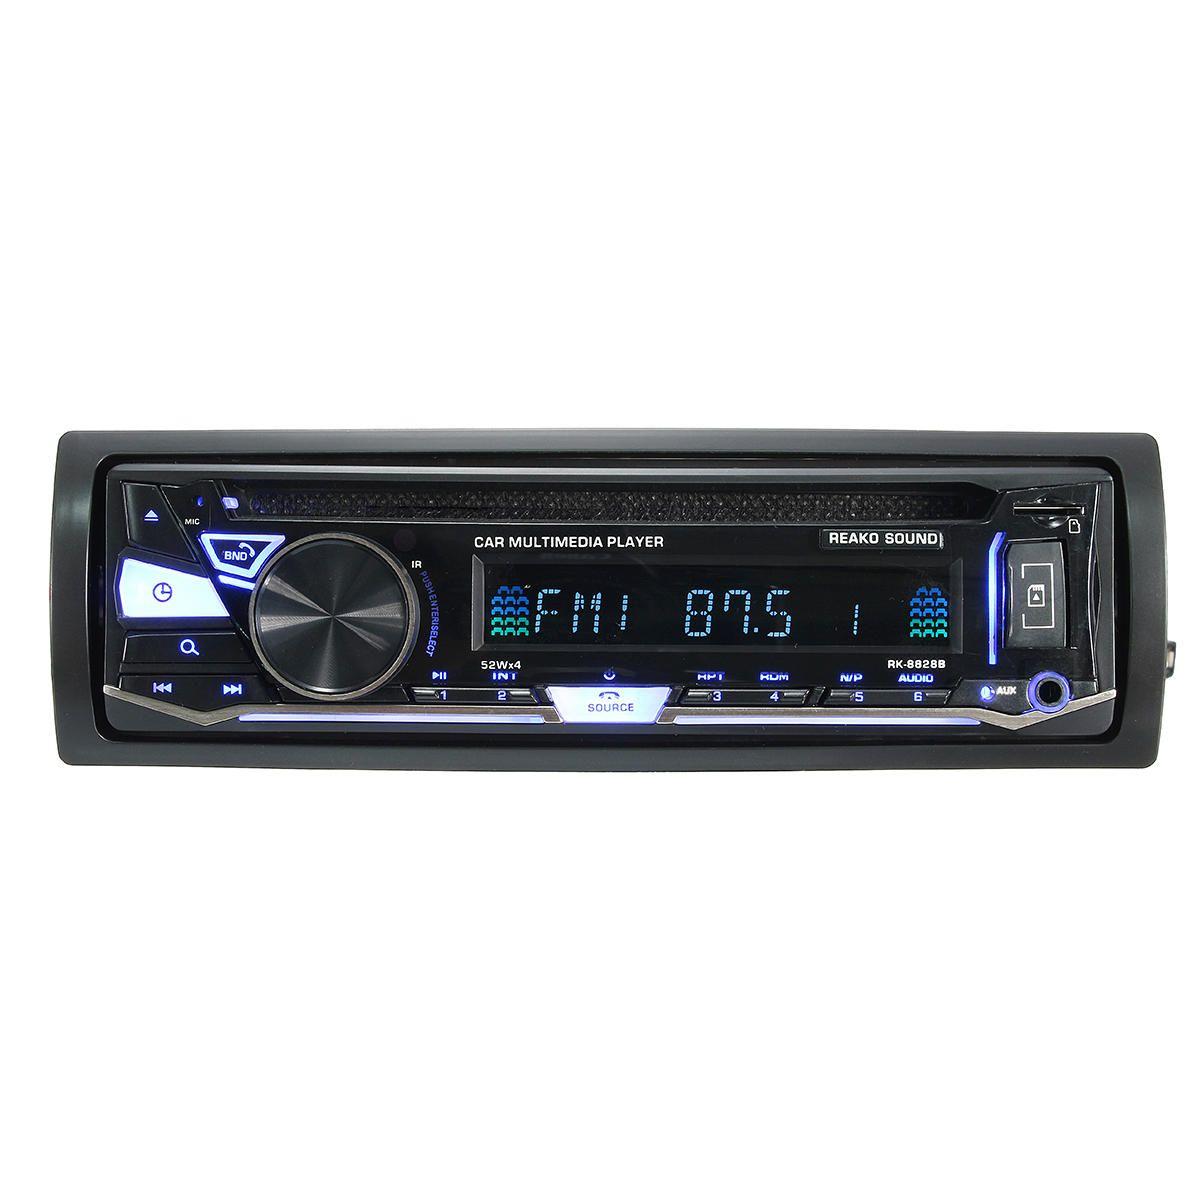 bluetooth Car Multimedia DVD Player with BT & DISC & FM/AM Radio & RDS Receiver